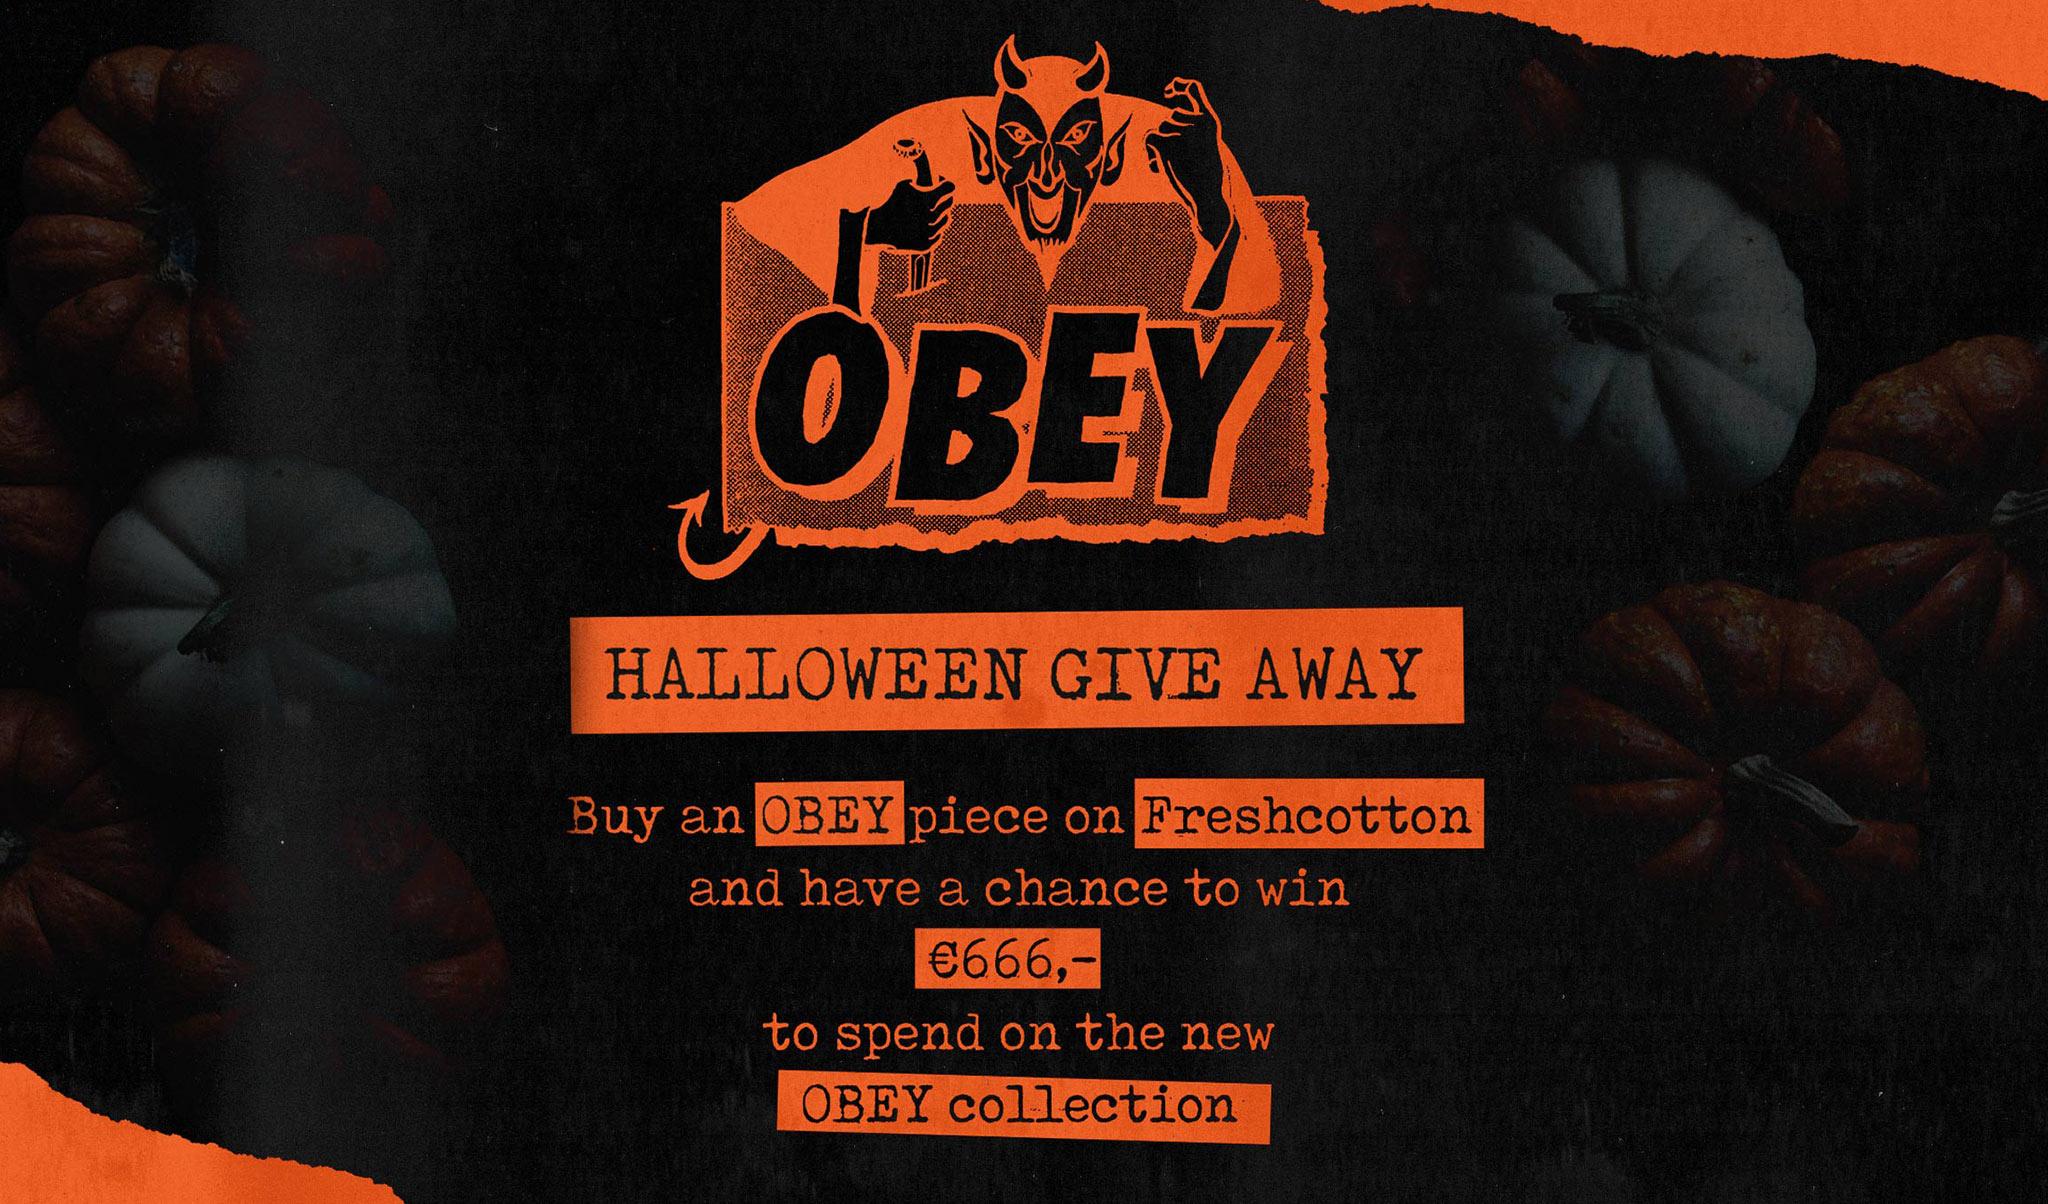 FRESHCOTTON x OBEY Give Away